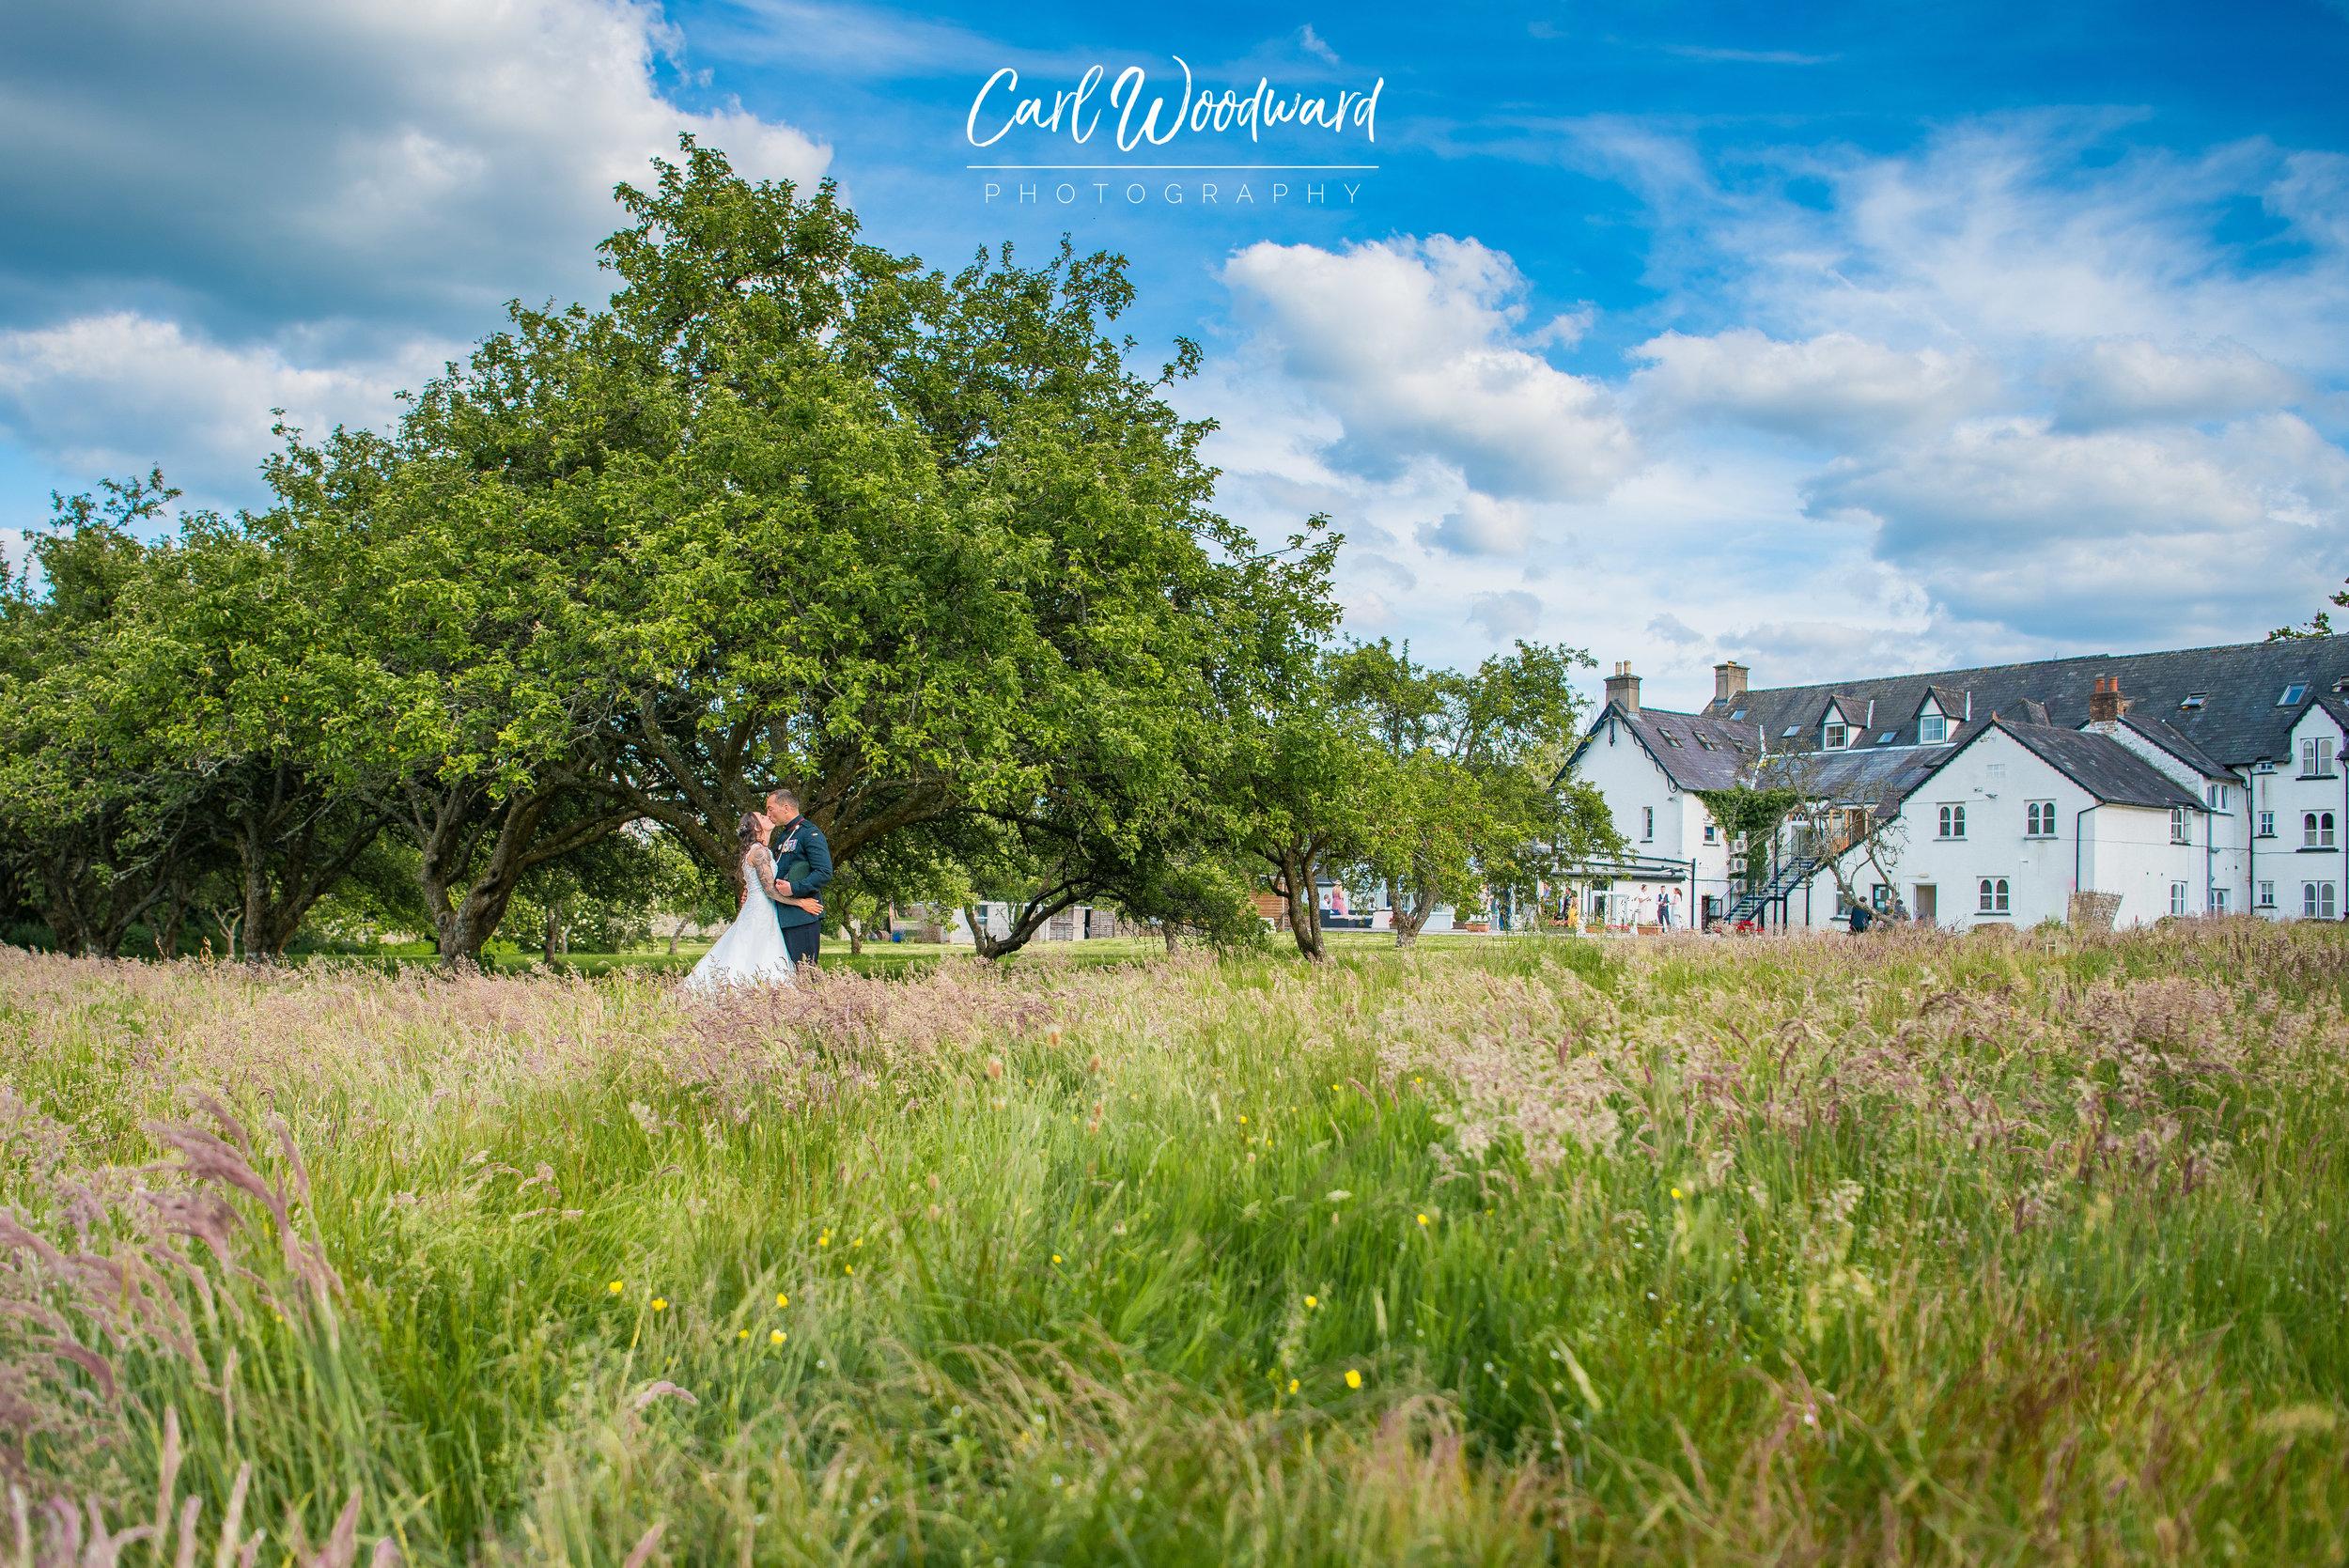 002The-Old-Rectory-Hotel-Wedding-Photography-Cardiff-Wedding-Photographer.jpg